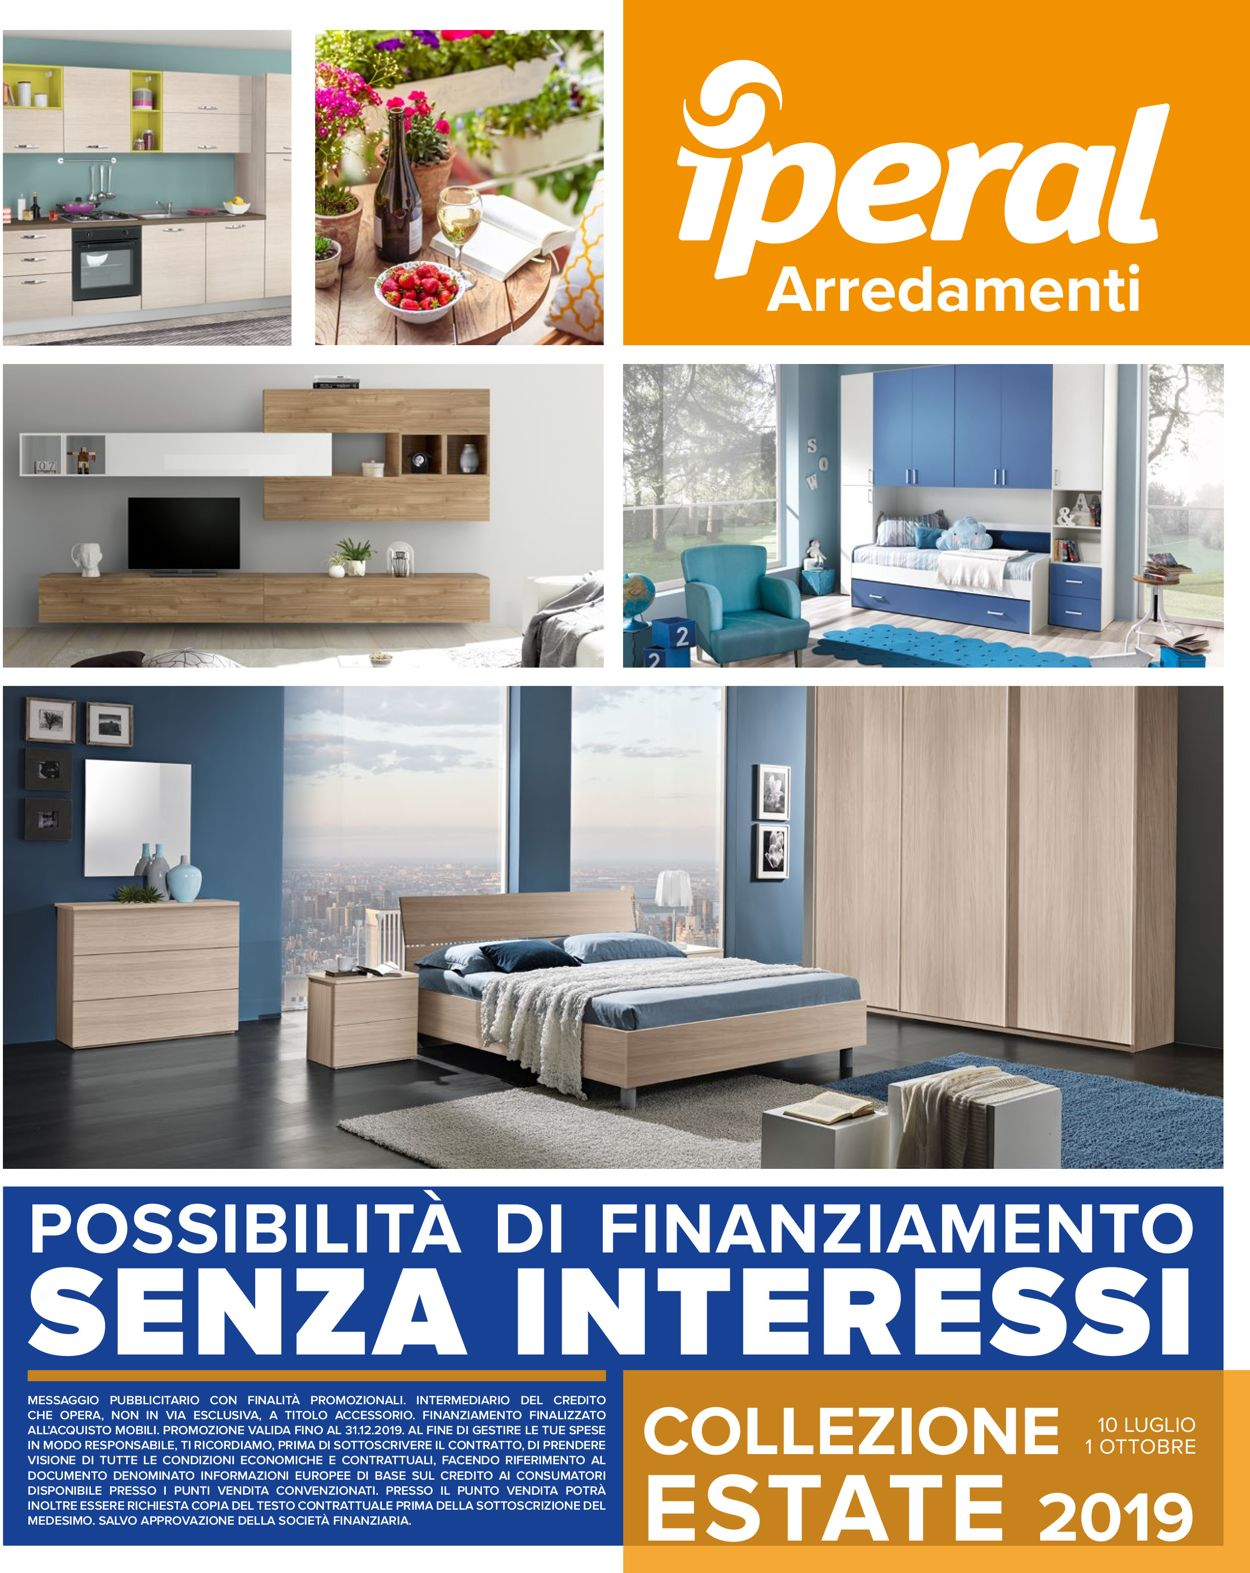 Volantino Iperal - Offerte 10/07-01/10/2019